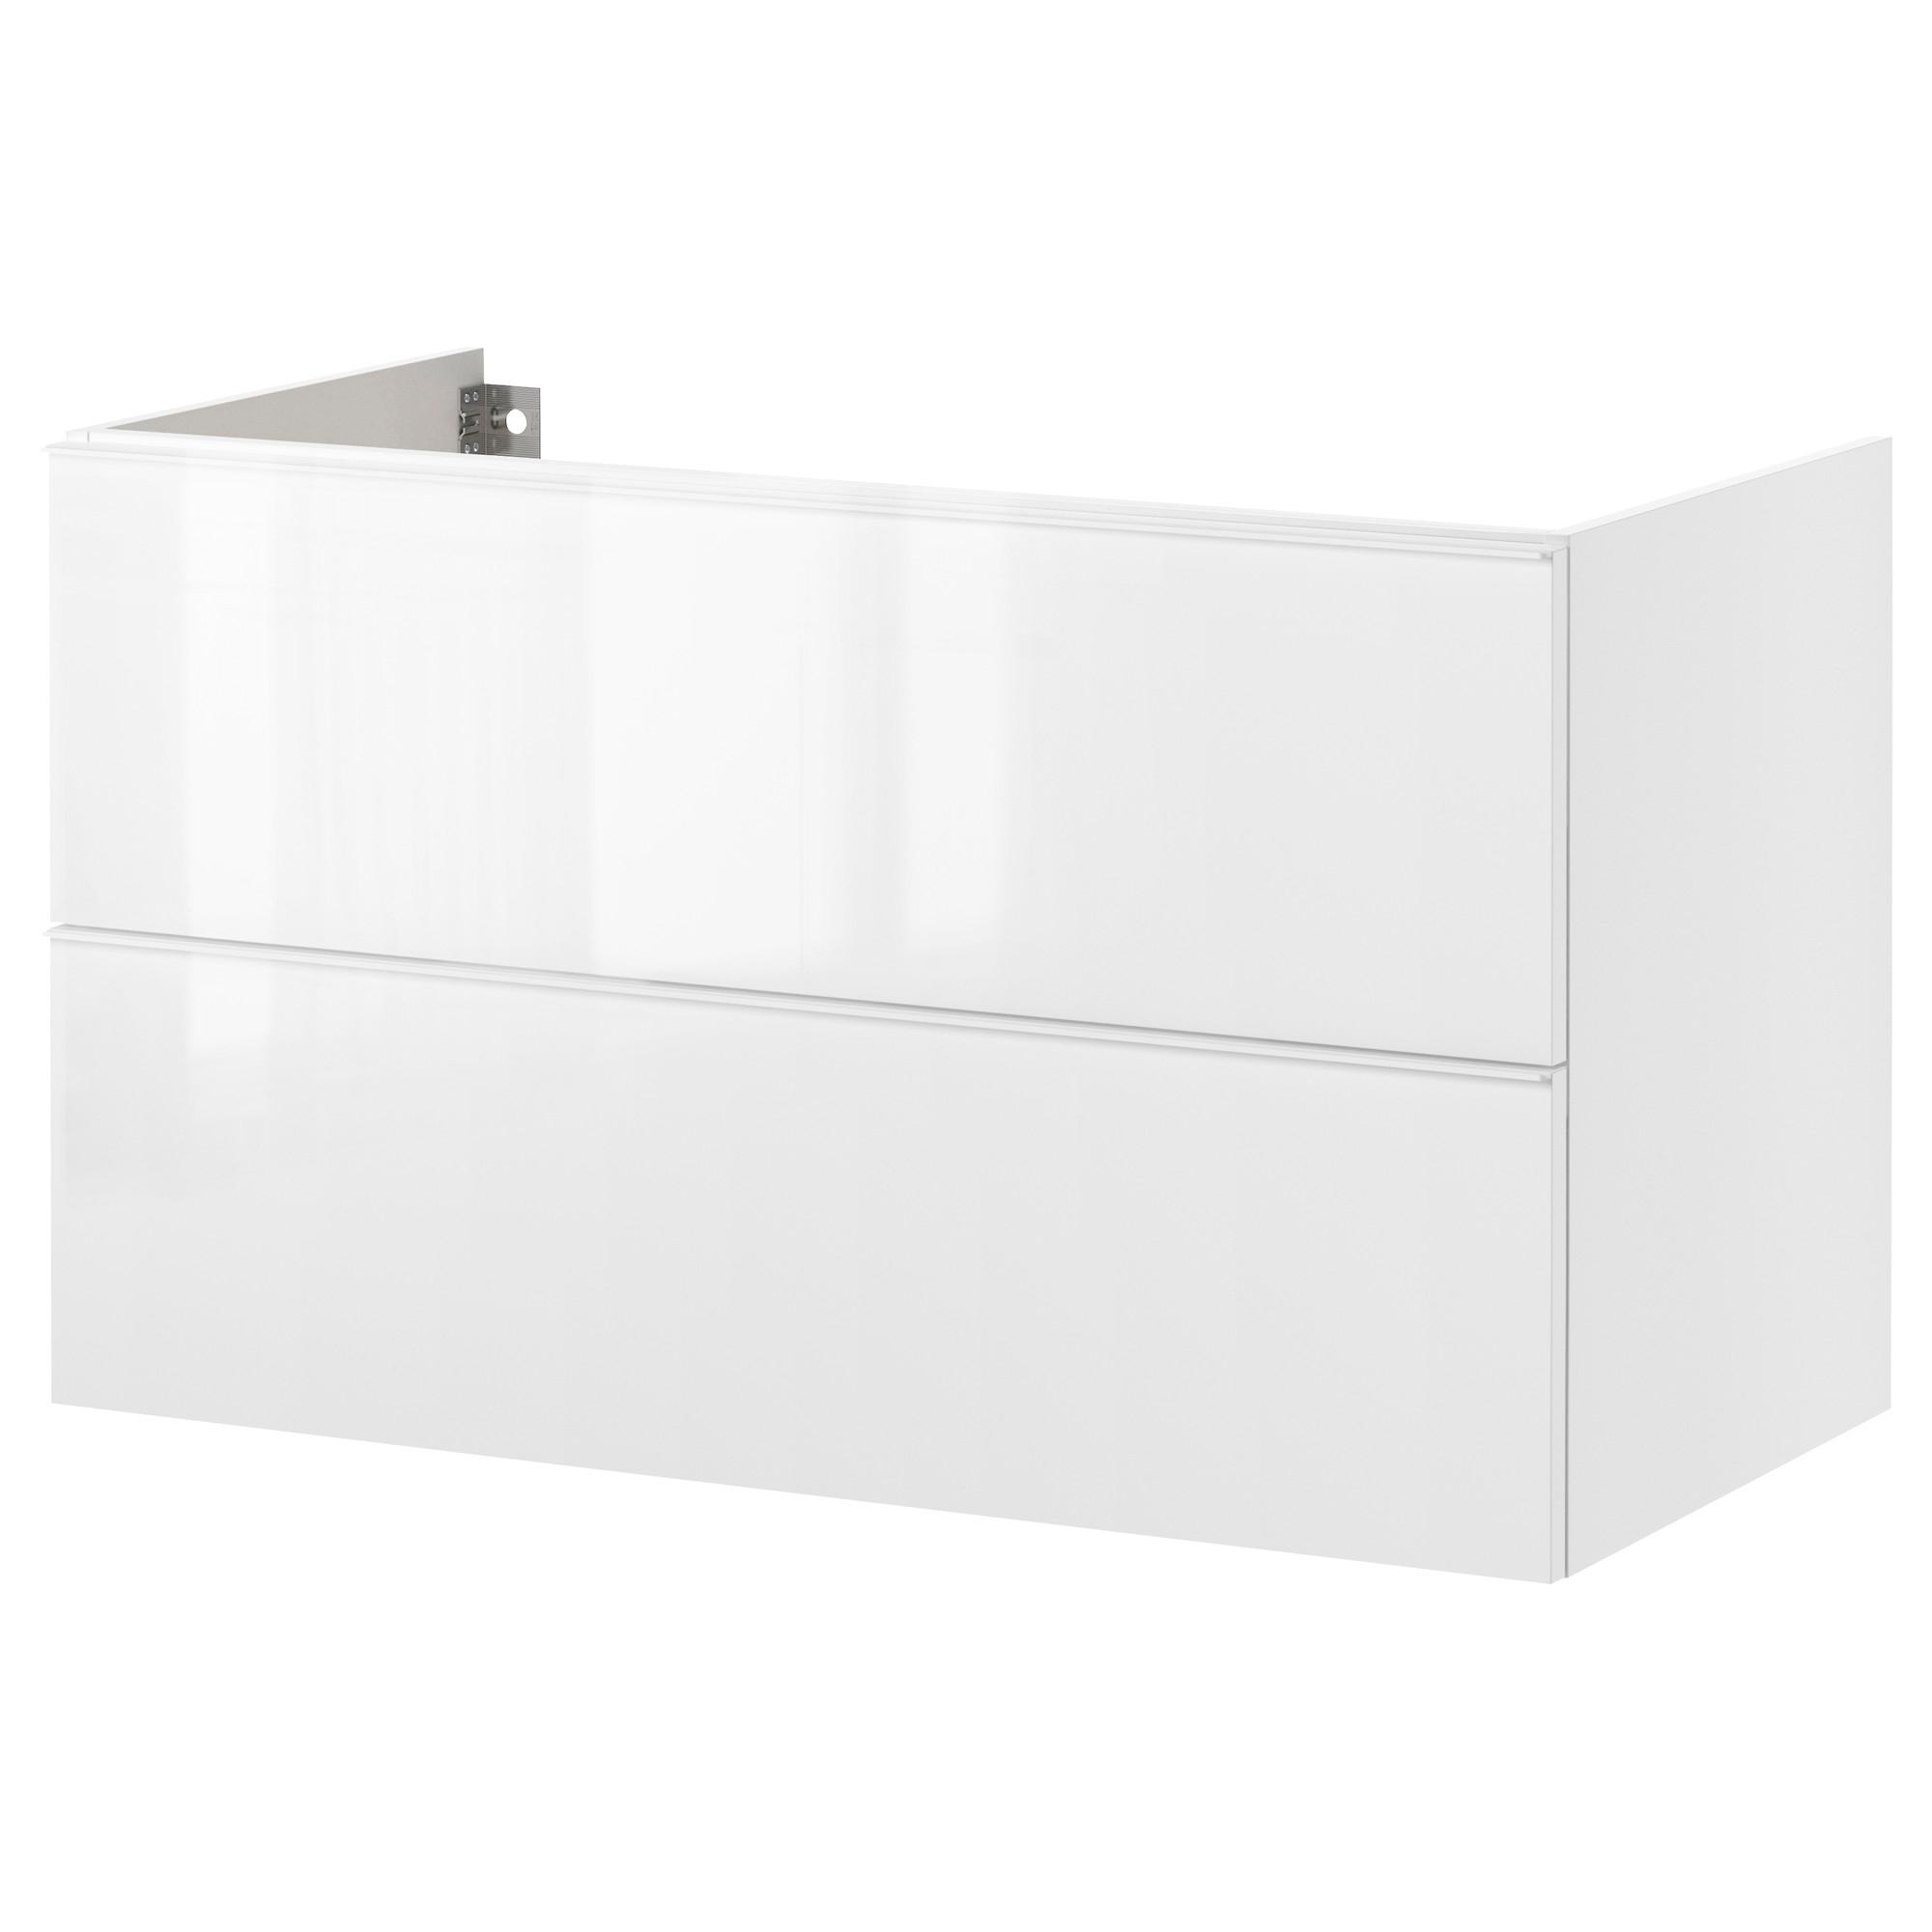 Godmorgon armario para lavamanos 2 cajones - Cajones armario ikea ...